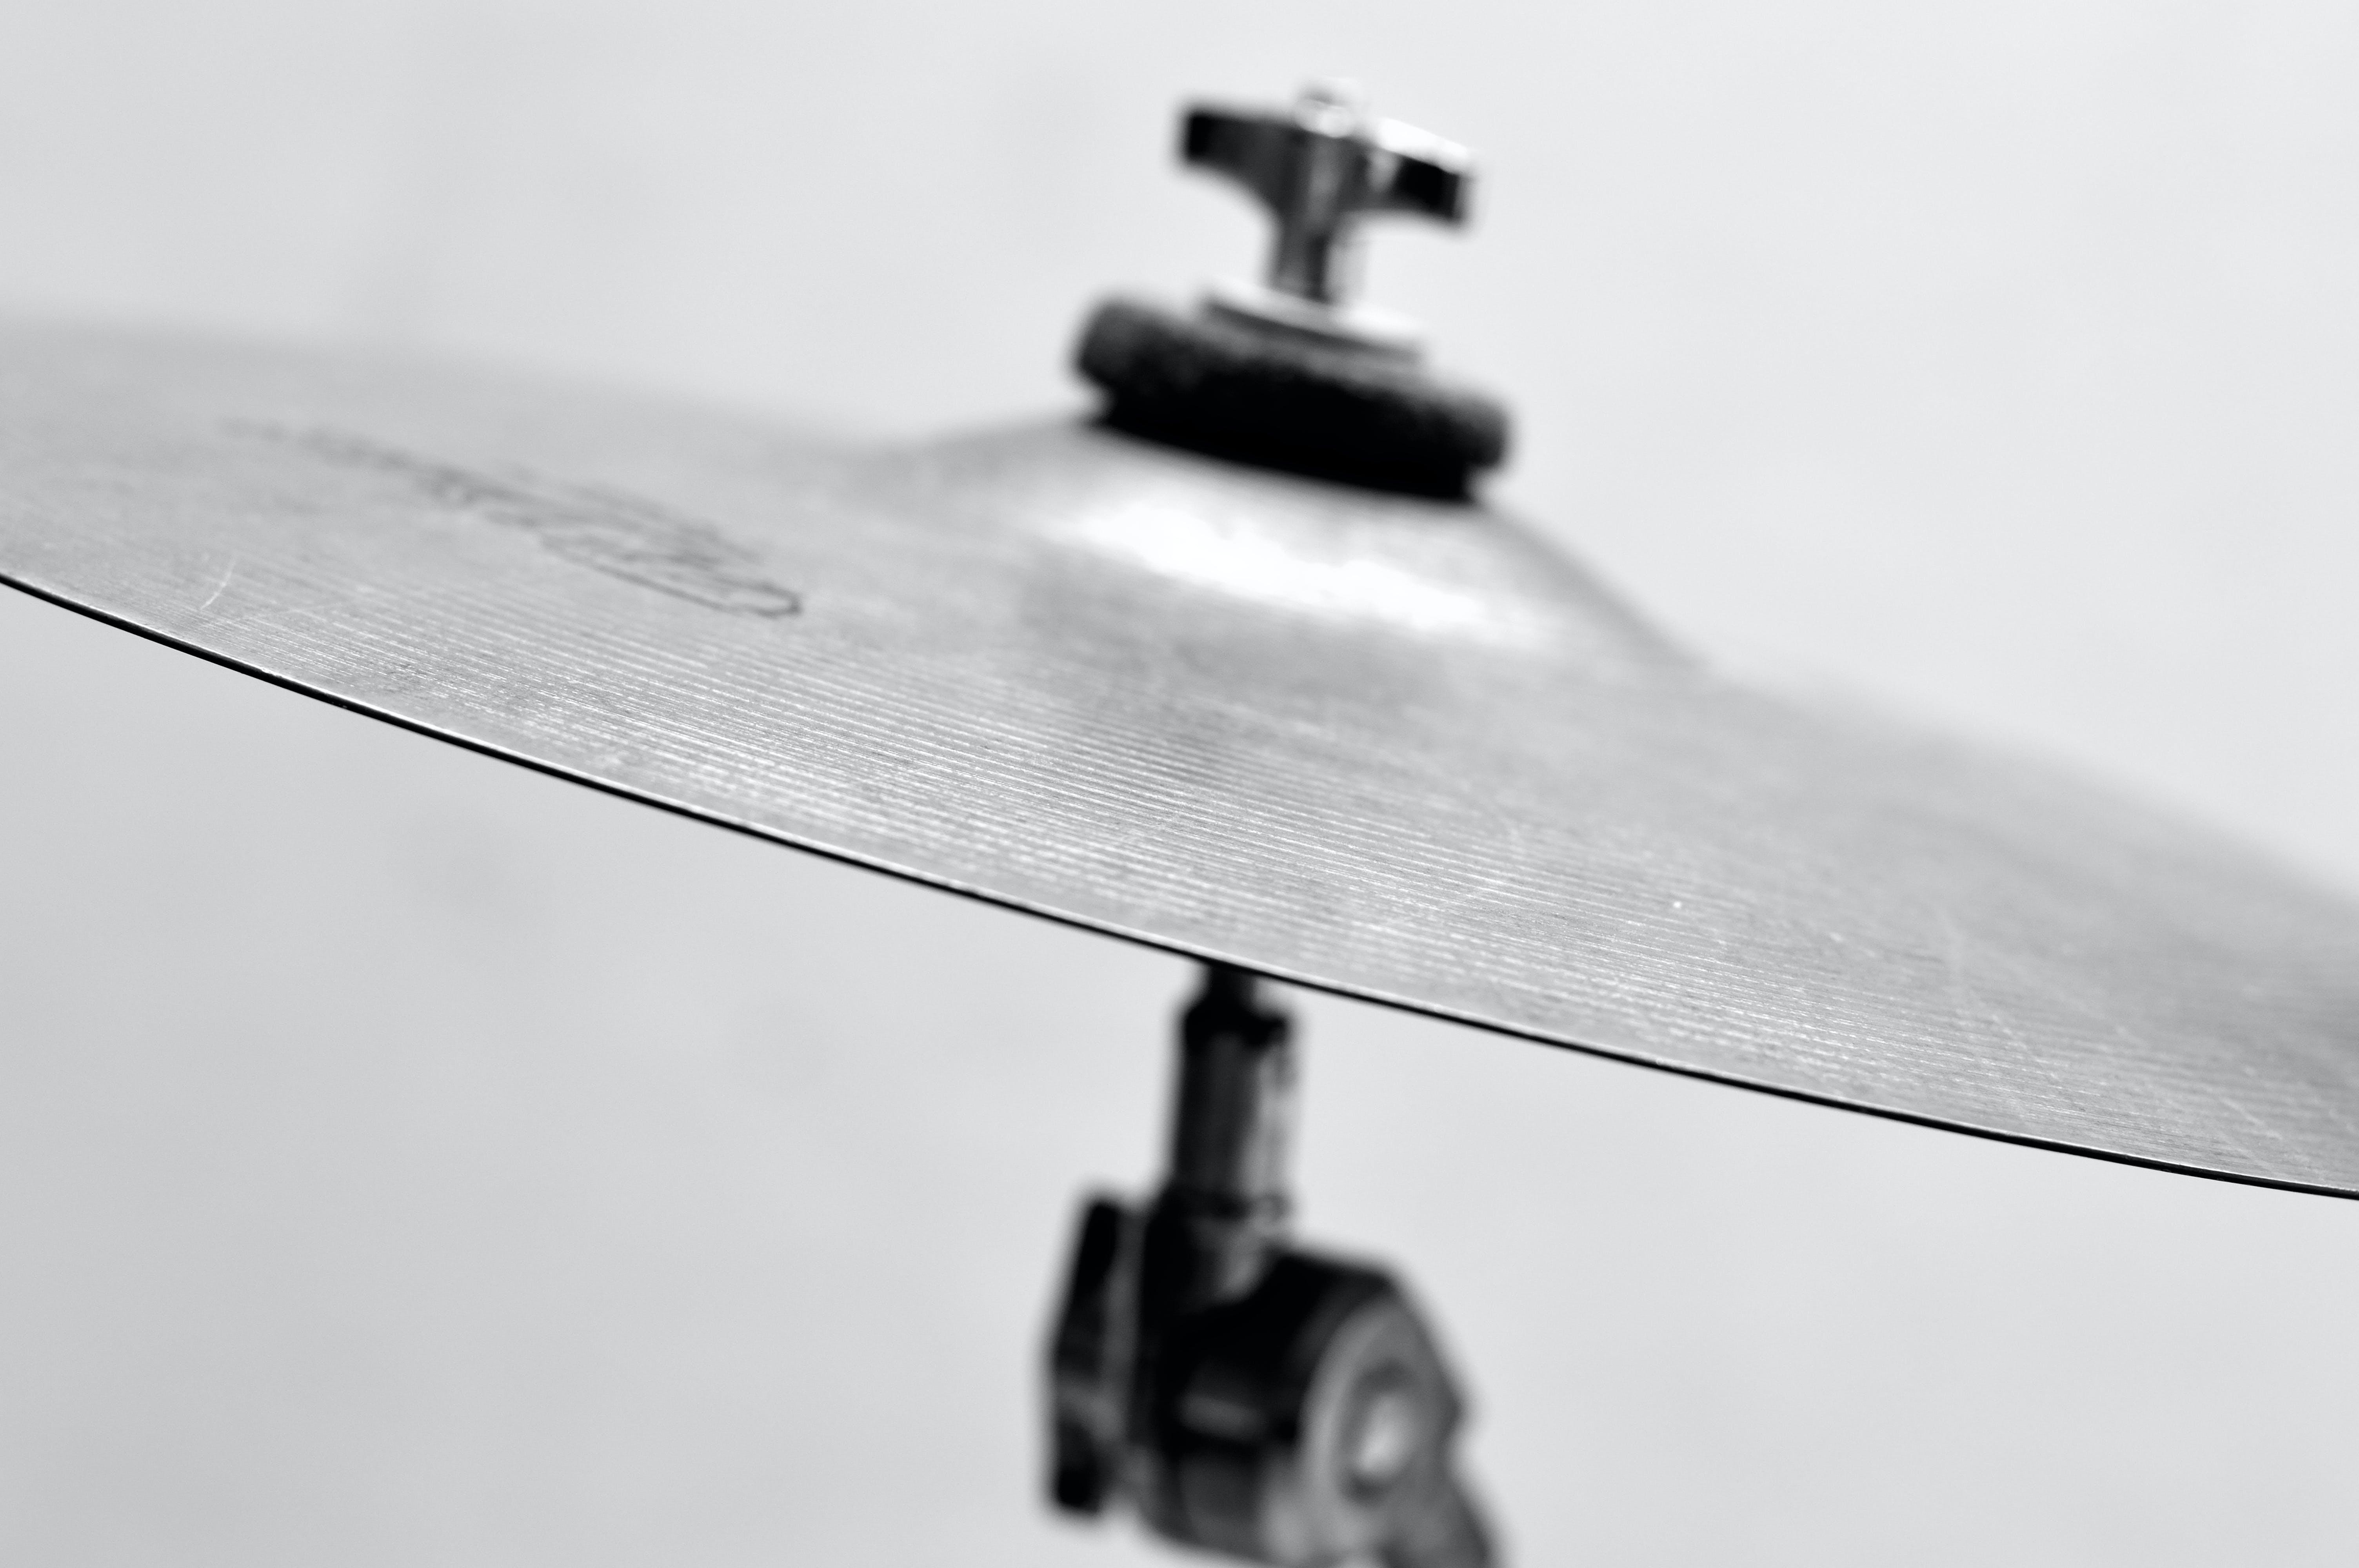 Selective Focus Photo of Gray Cymbal